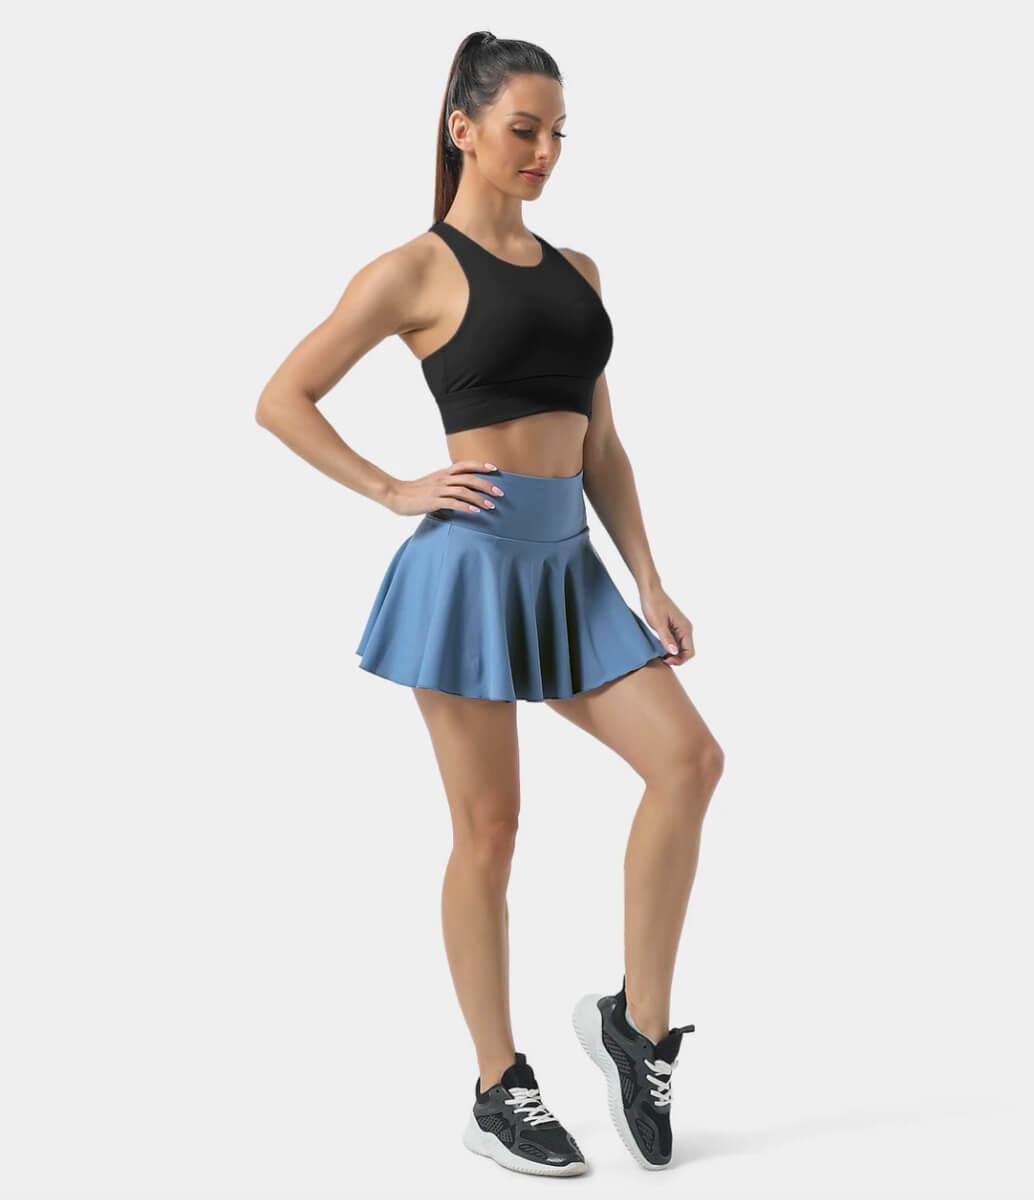 halara-tennis-skirt-091421